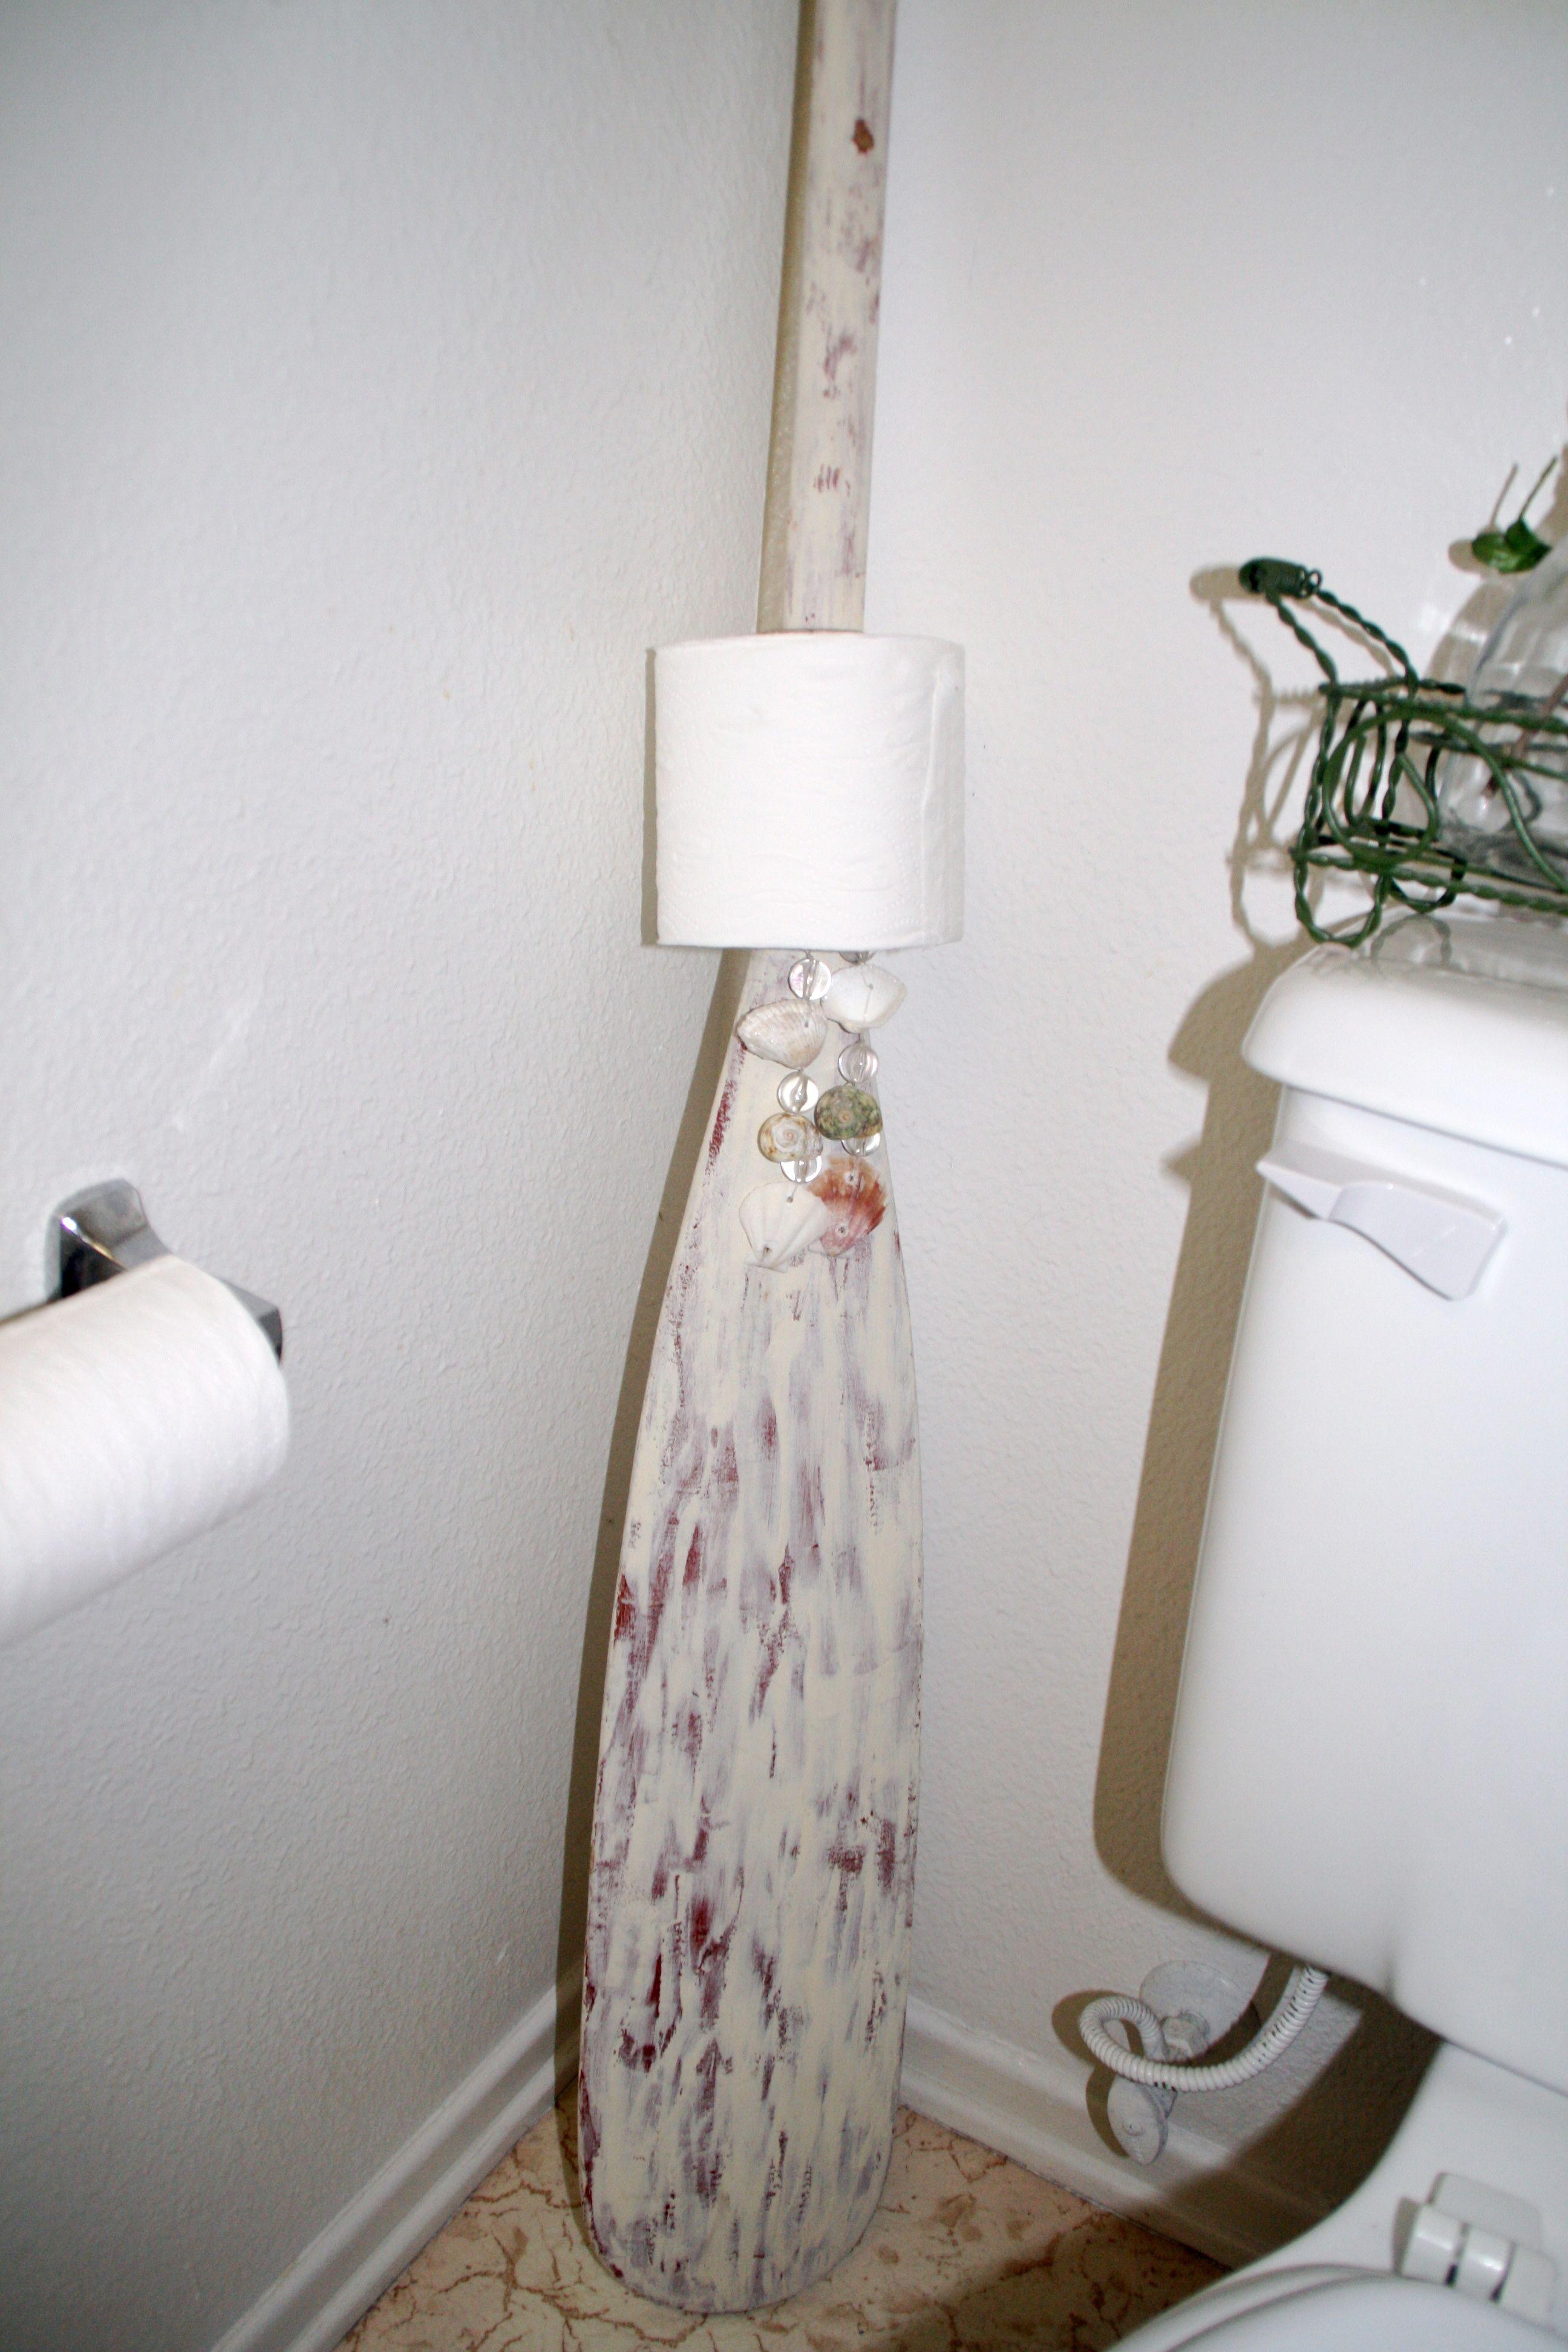 Old Oar Used As Toilet Paper Holder Home Design Diy